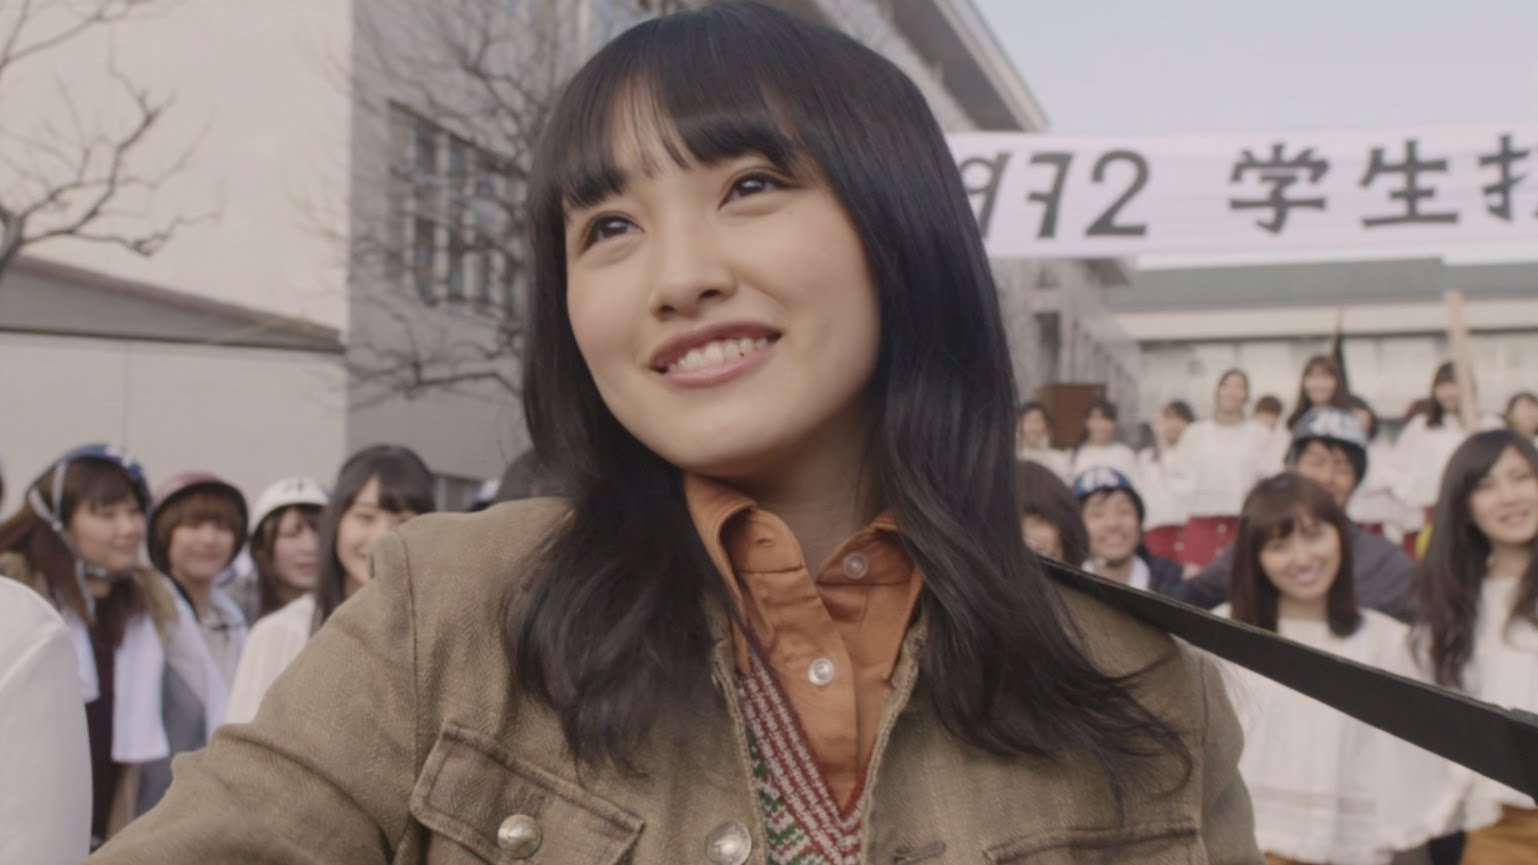 【MV】翼はいらない Short ver./ AKB48[公式] - YouTube